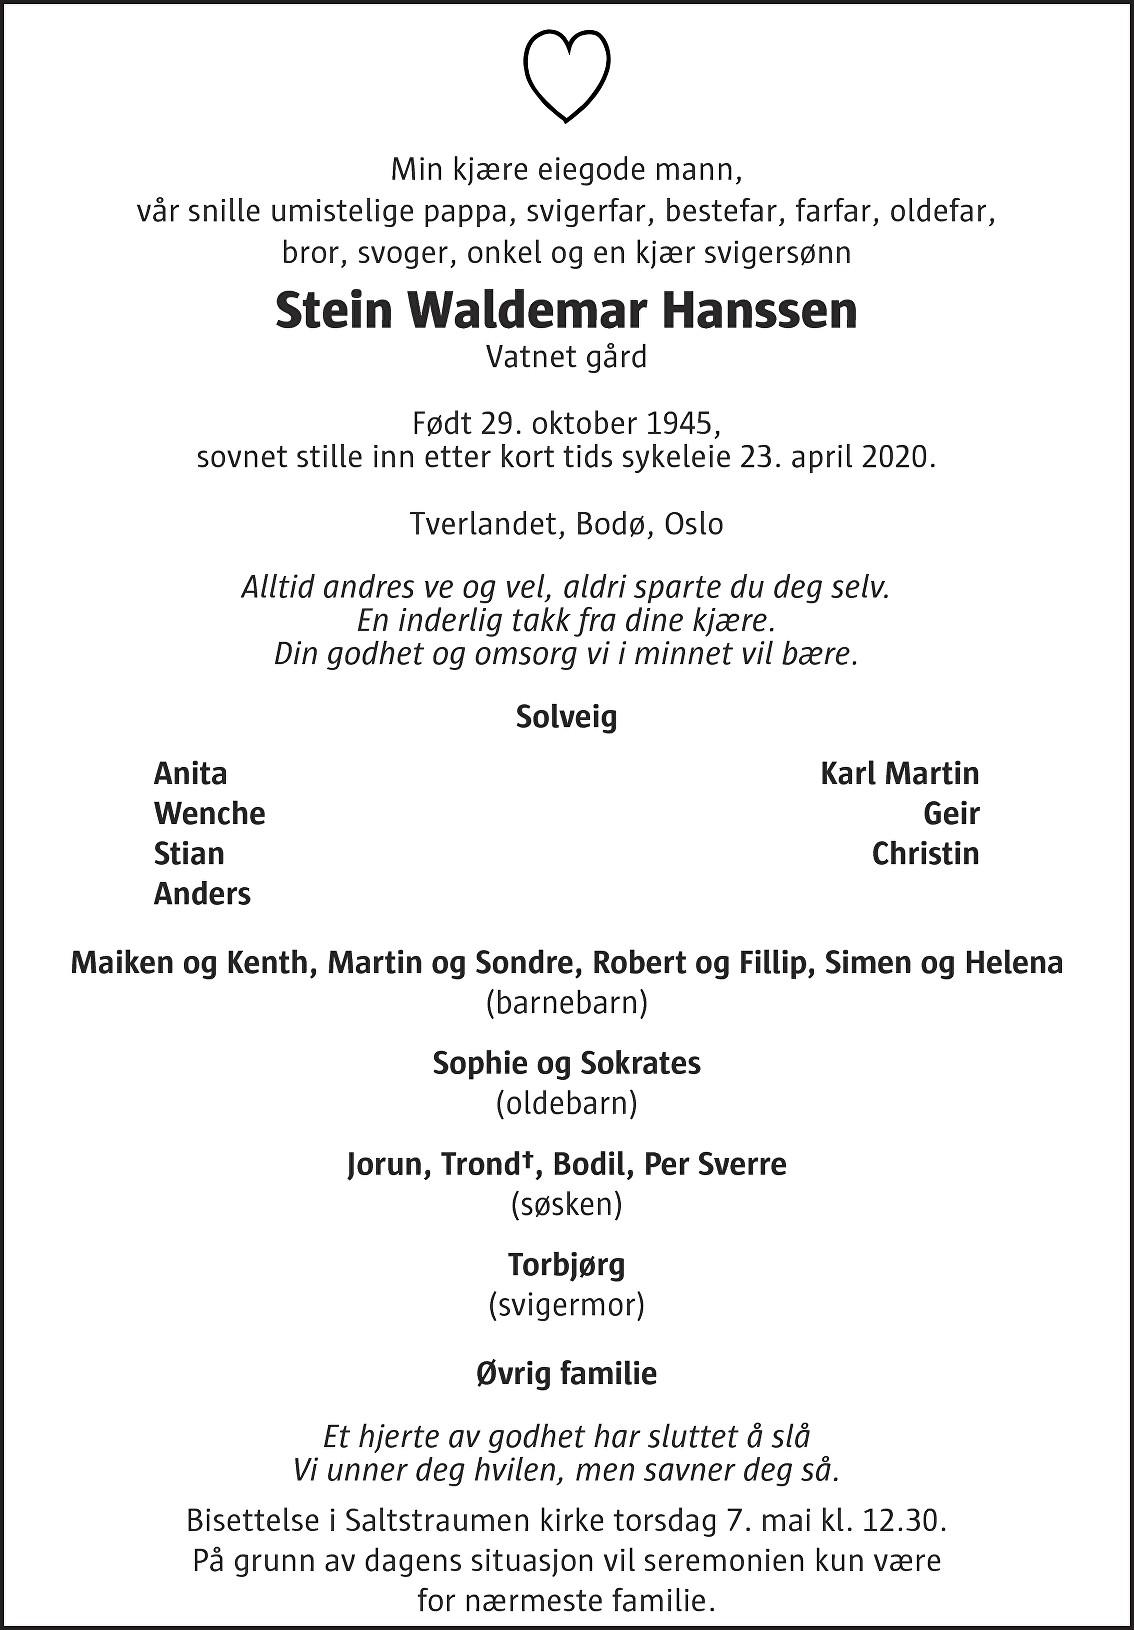 Stein Waldemar Hanssen Dødsannonse